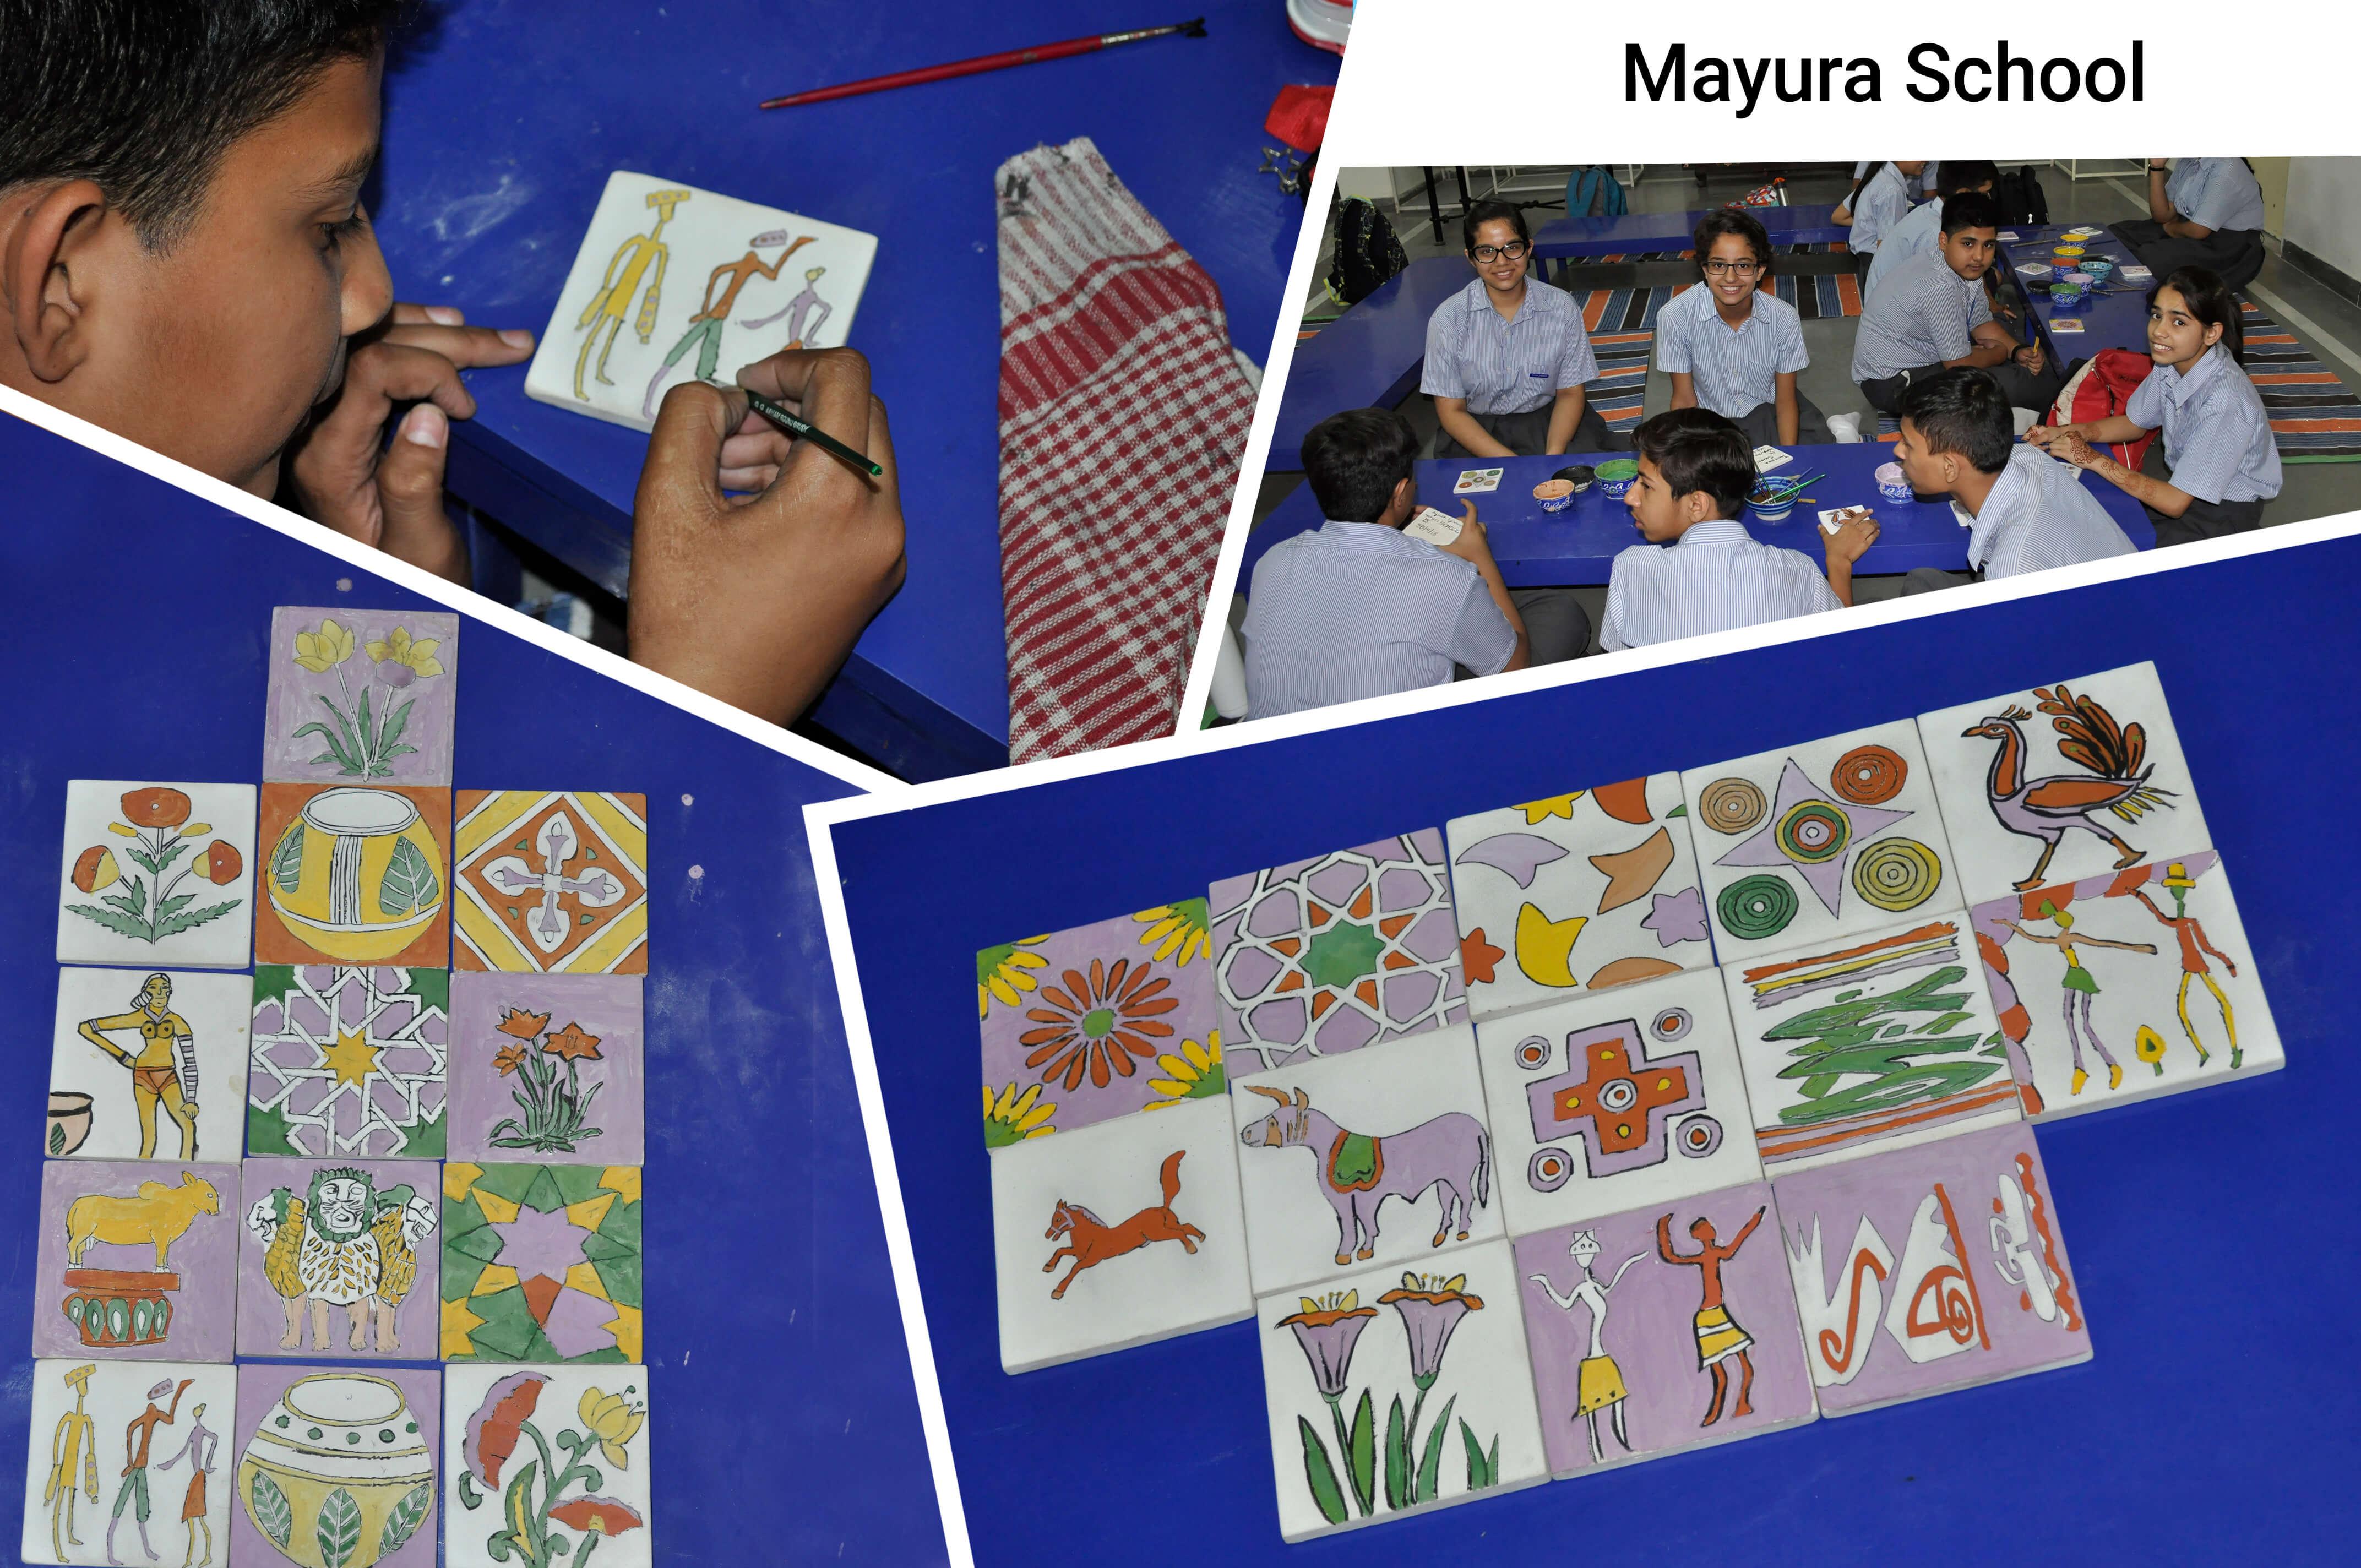 Mayura School